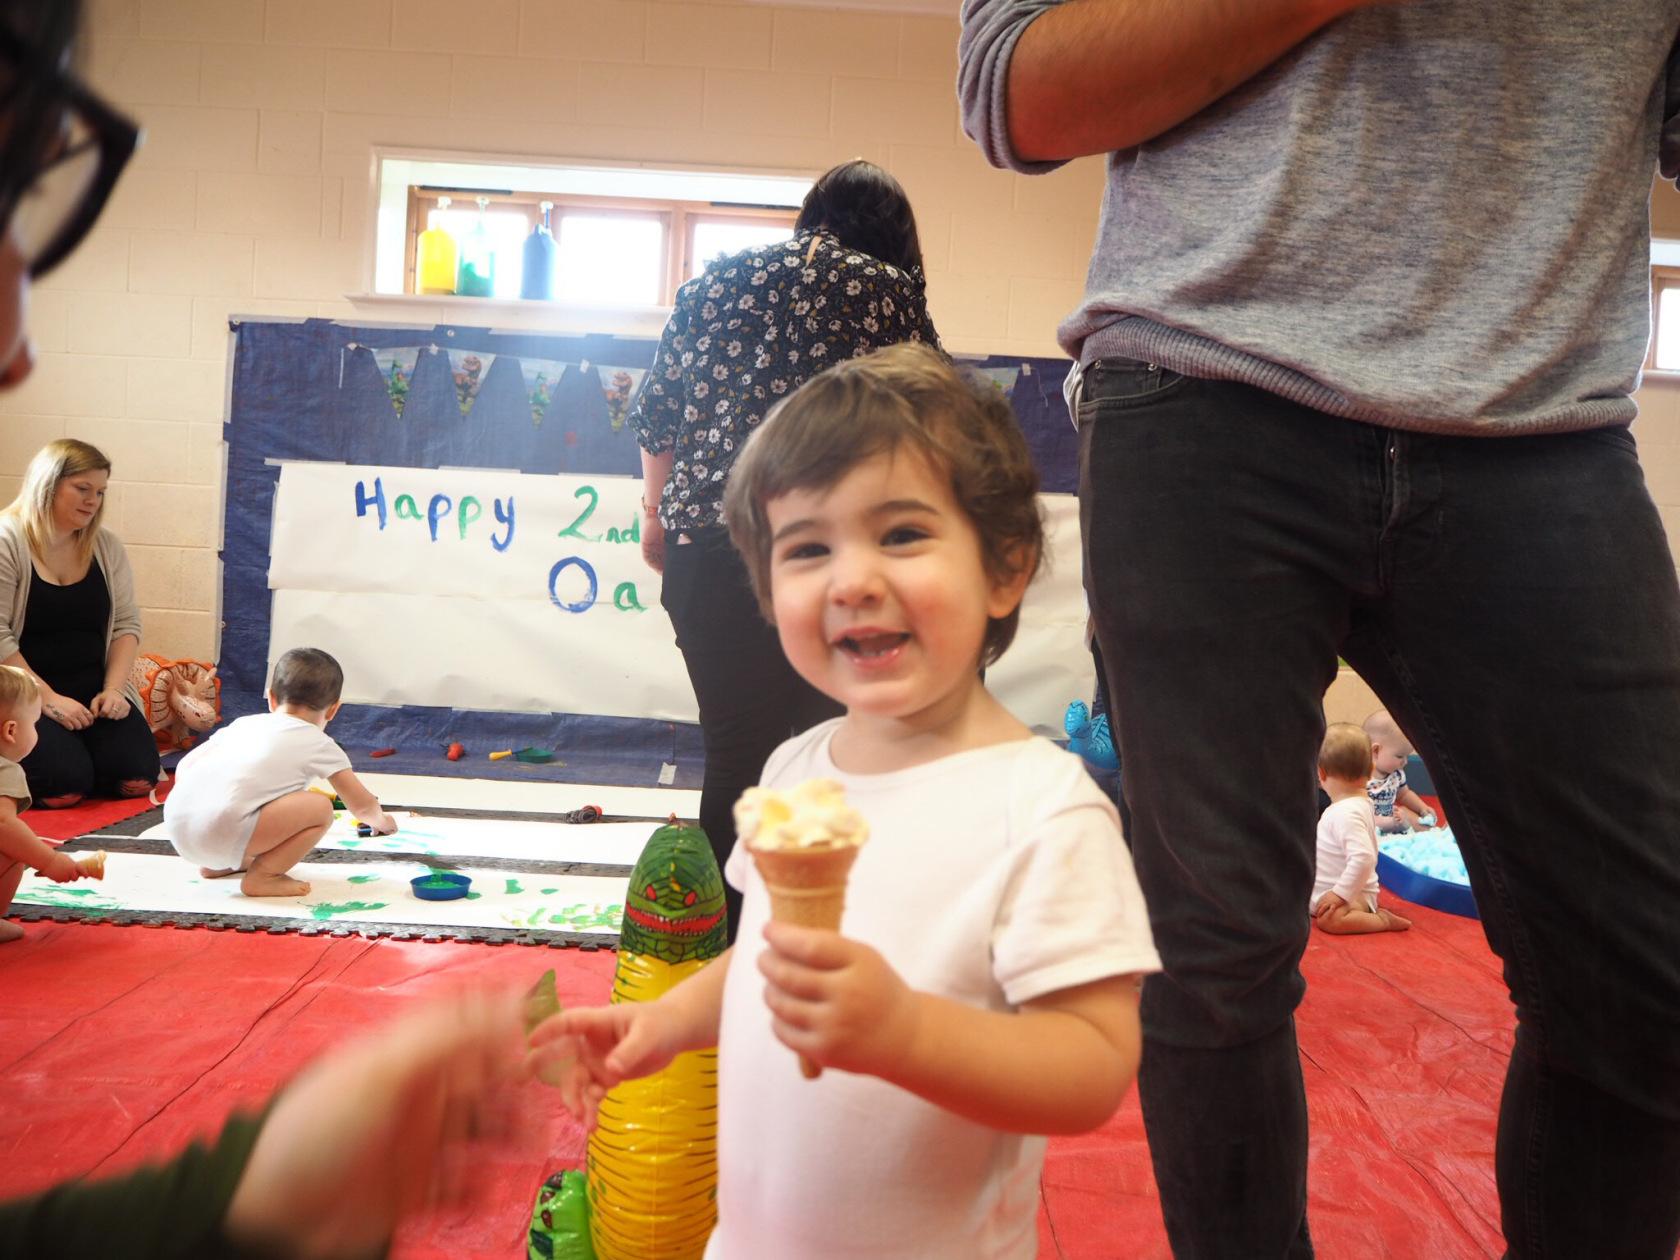 mummy blog, child's birthday, boys birthday parties